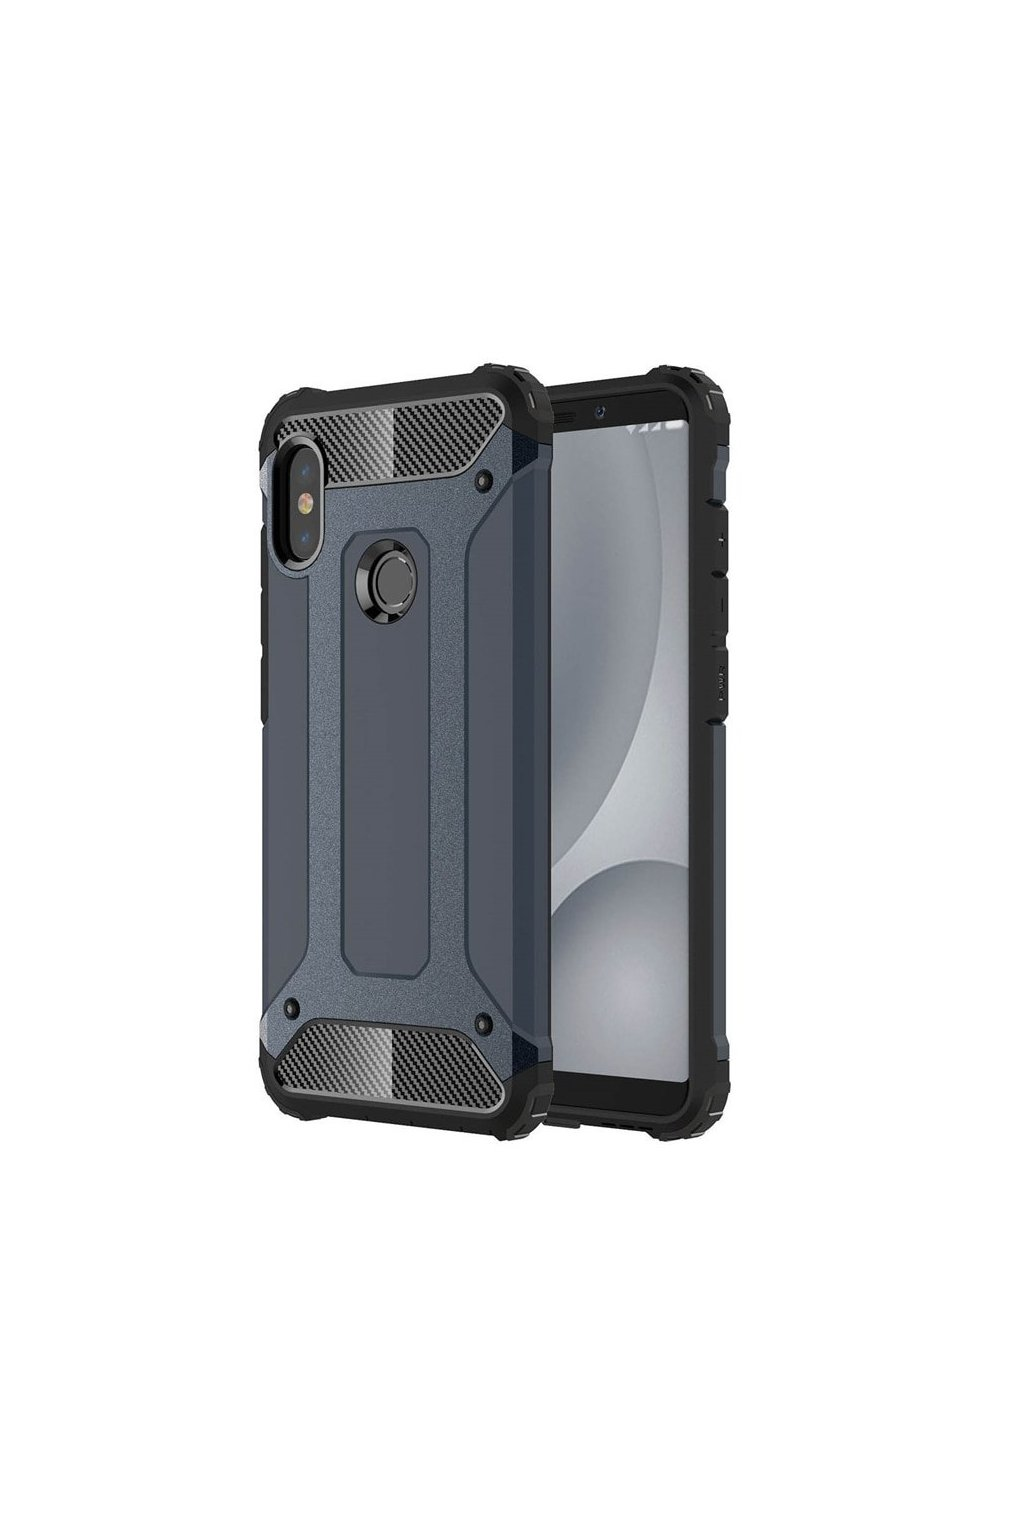 eng pl Hybrid Armor Case Tough Rugged Cover for Xiaomi Mi A2 Lite Redmi 6 Pro blue 45736 1